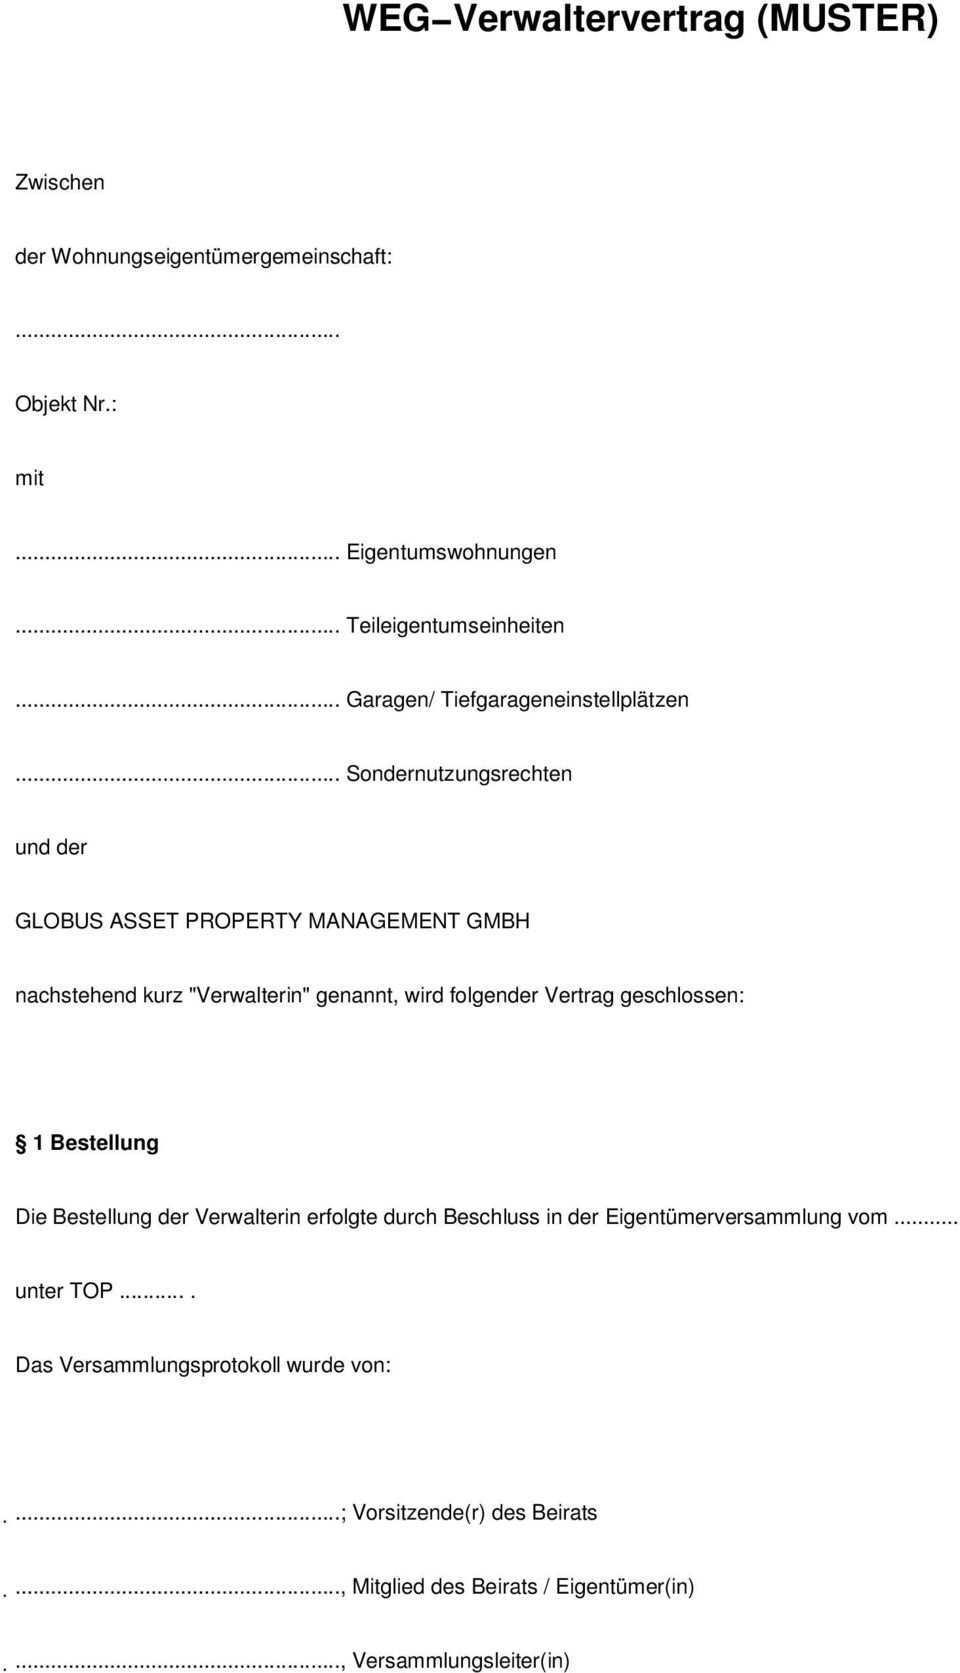 Weg Verwaltervertrag Muster Pdf Free Download